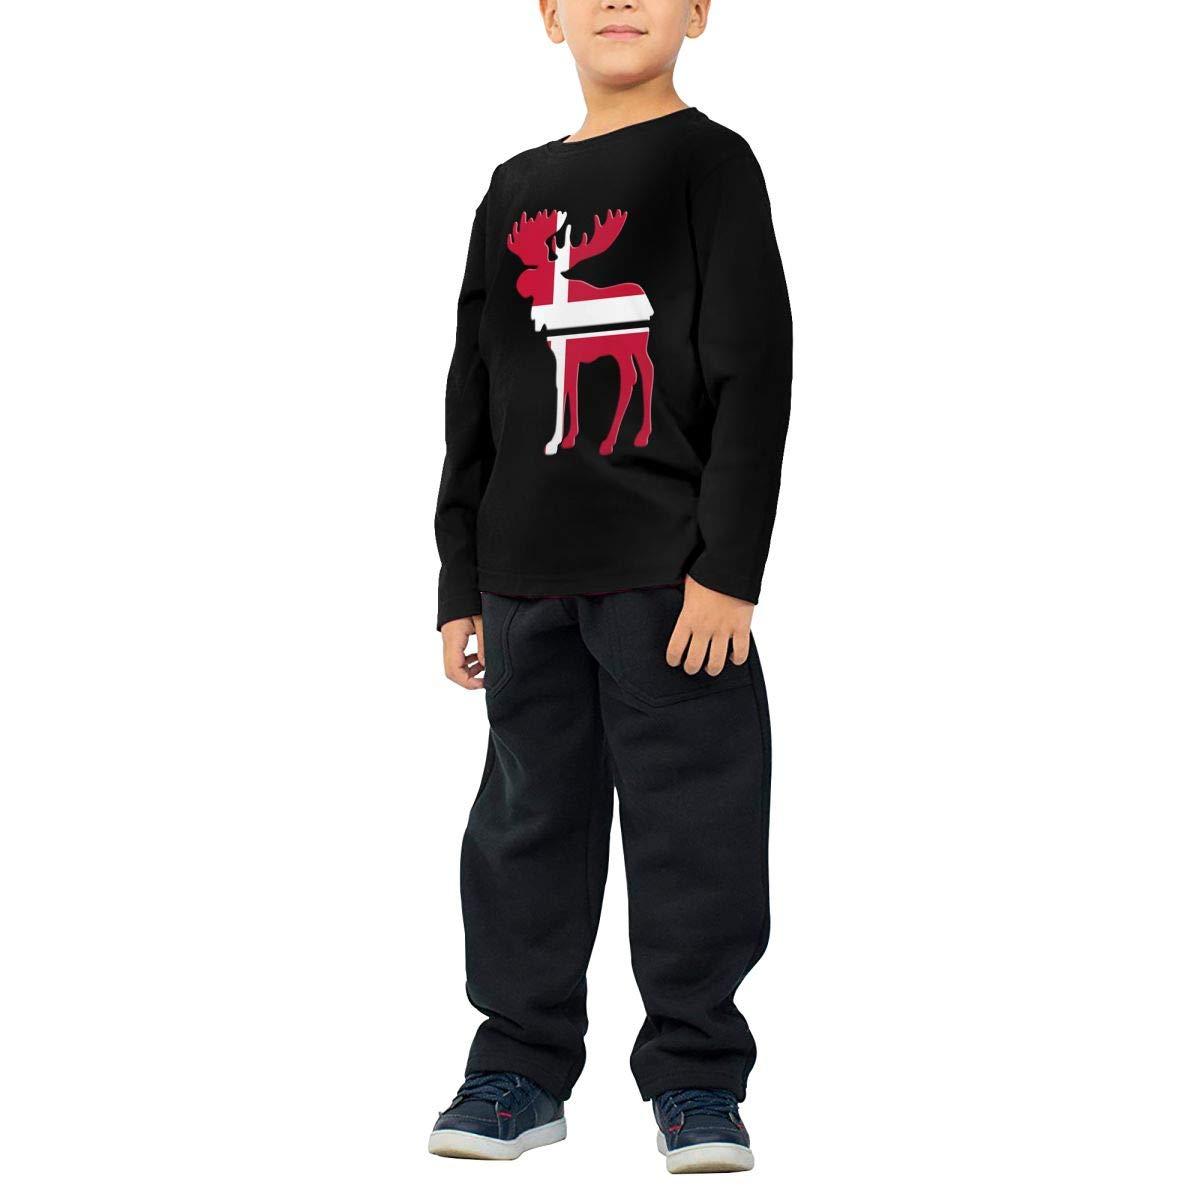 Fryhyu8 Newborn Kids Moose Denmark Flag Printed Long Sleeve 100/% Cotton Infants T Shirts